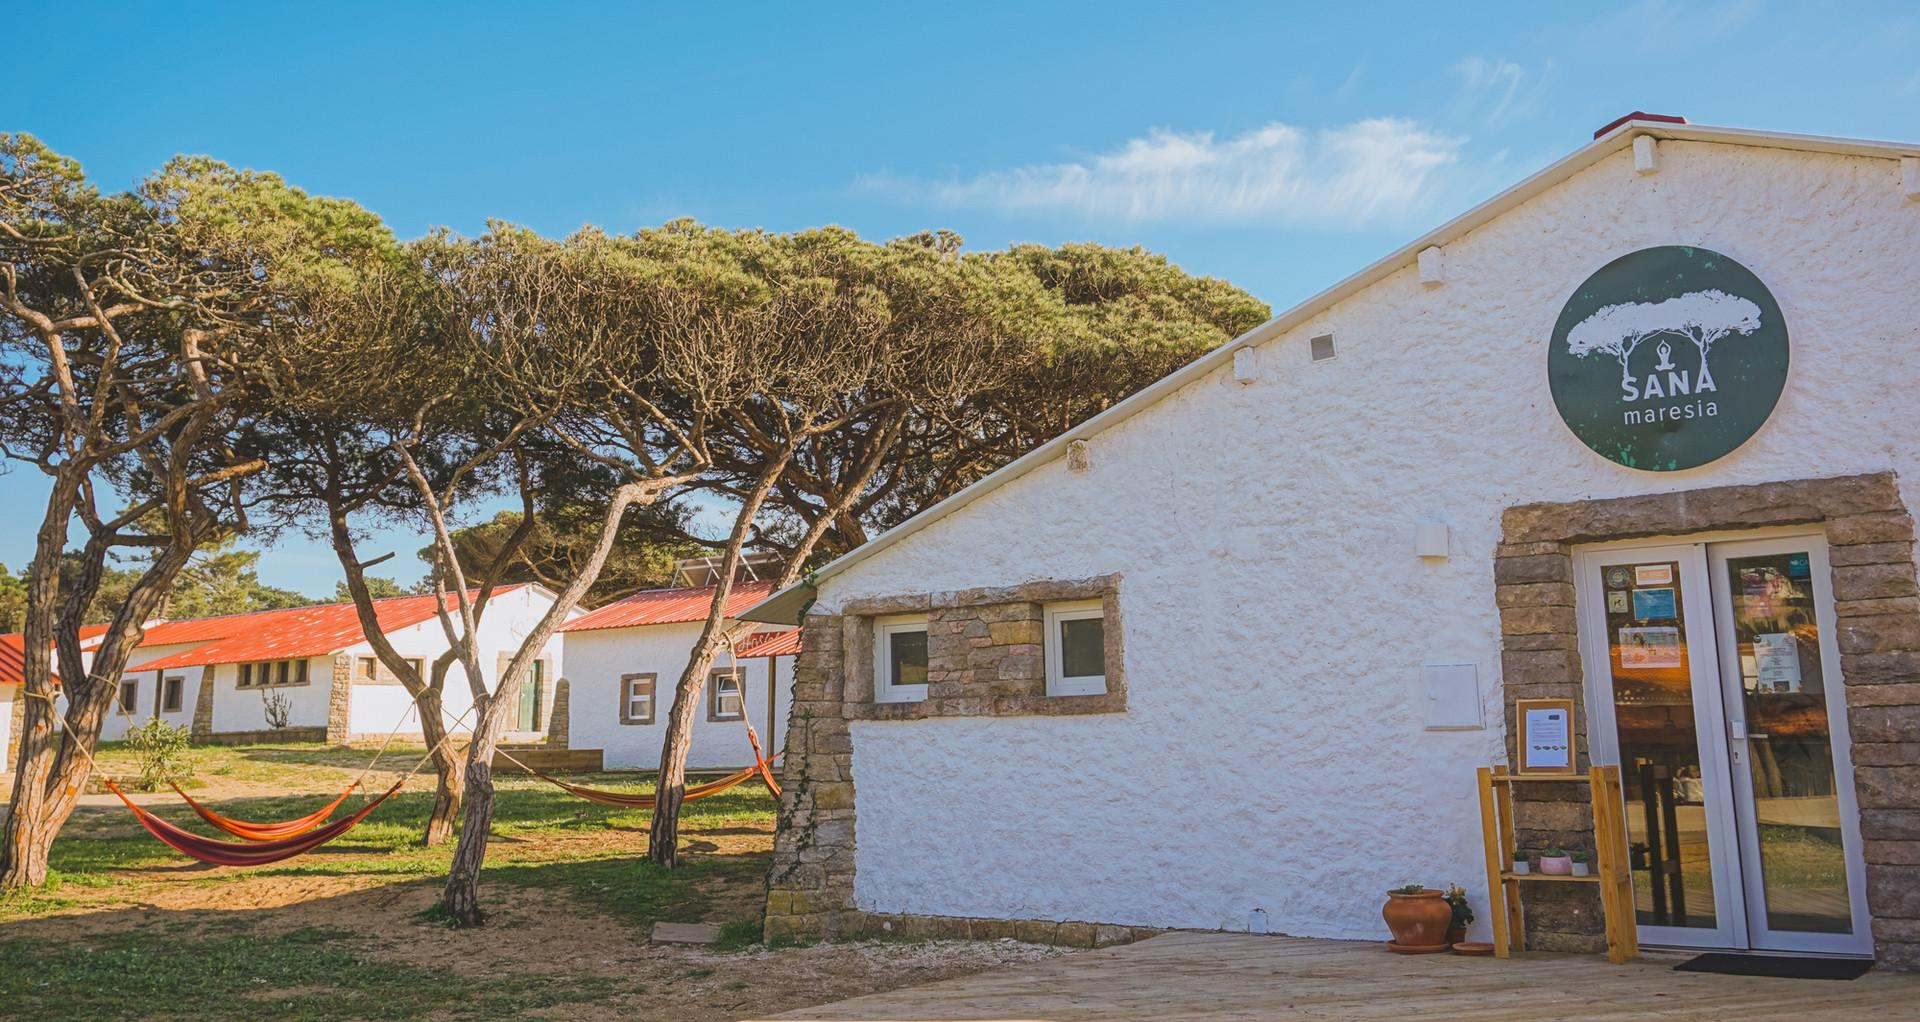 Sana Maresia at Aldeia da Praia.jpg